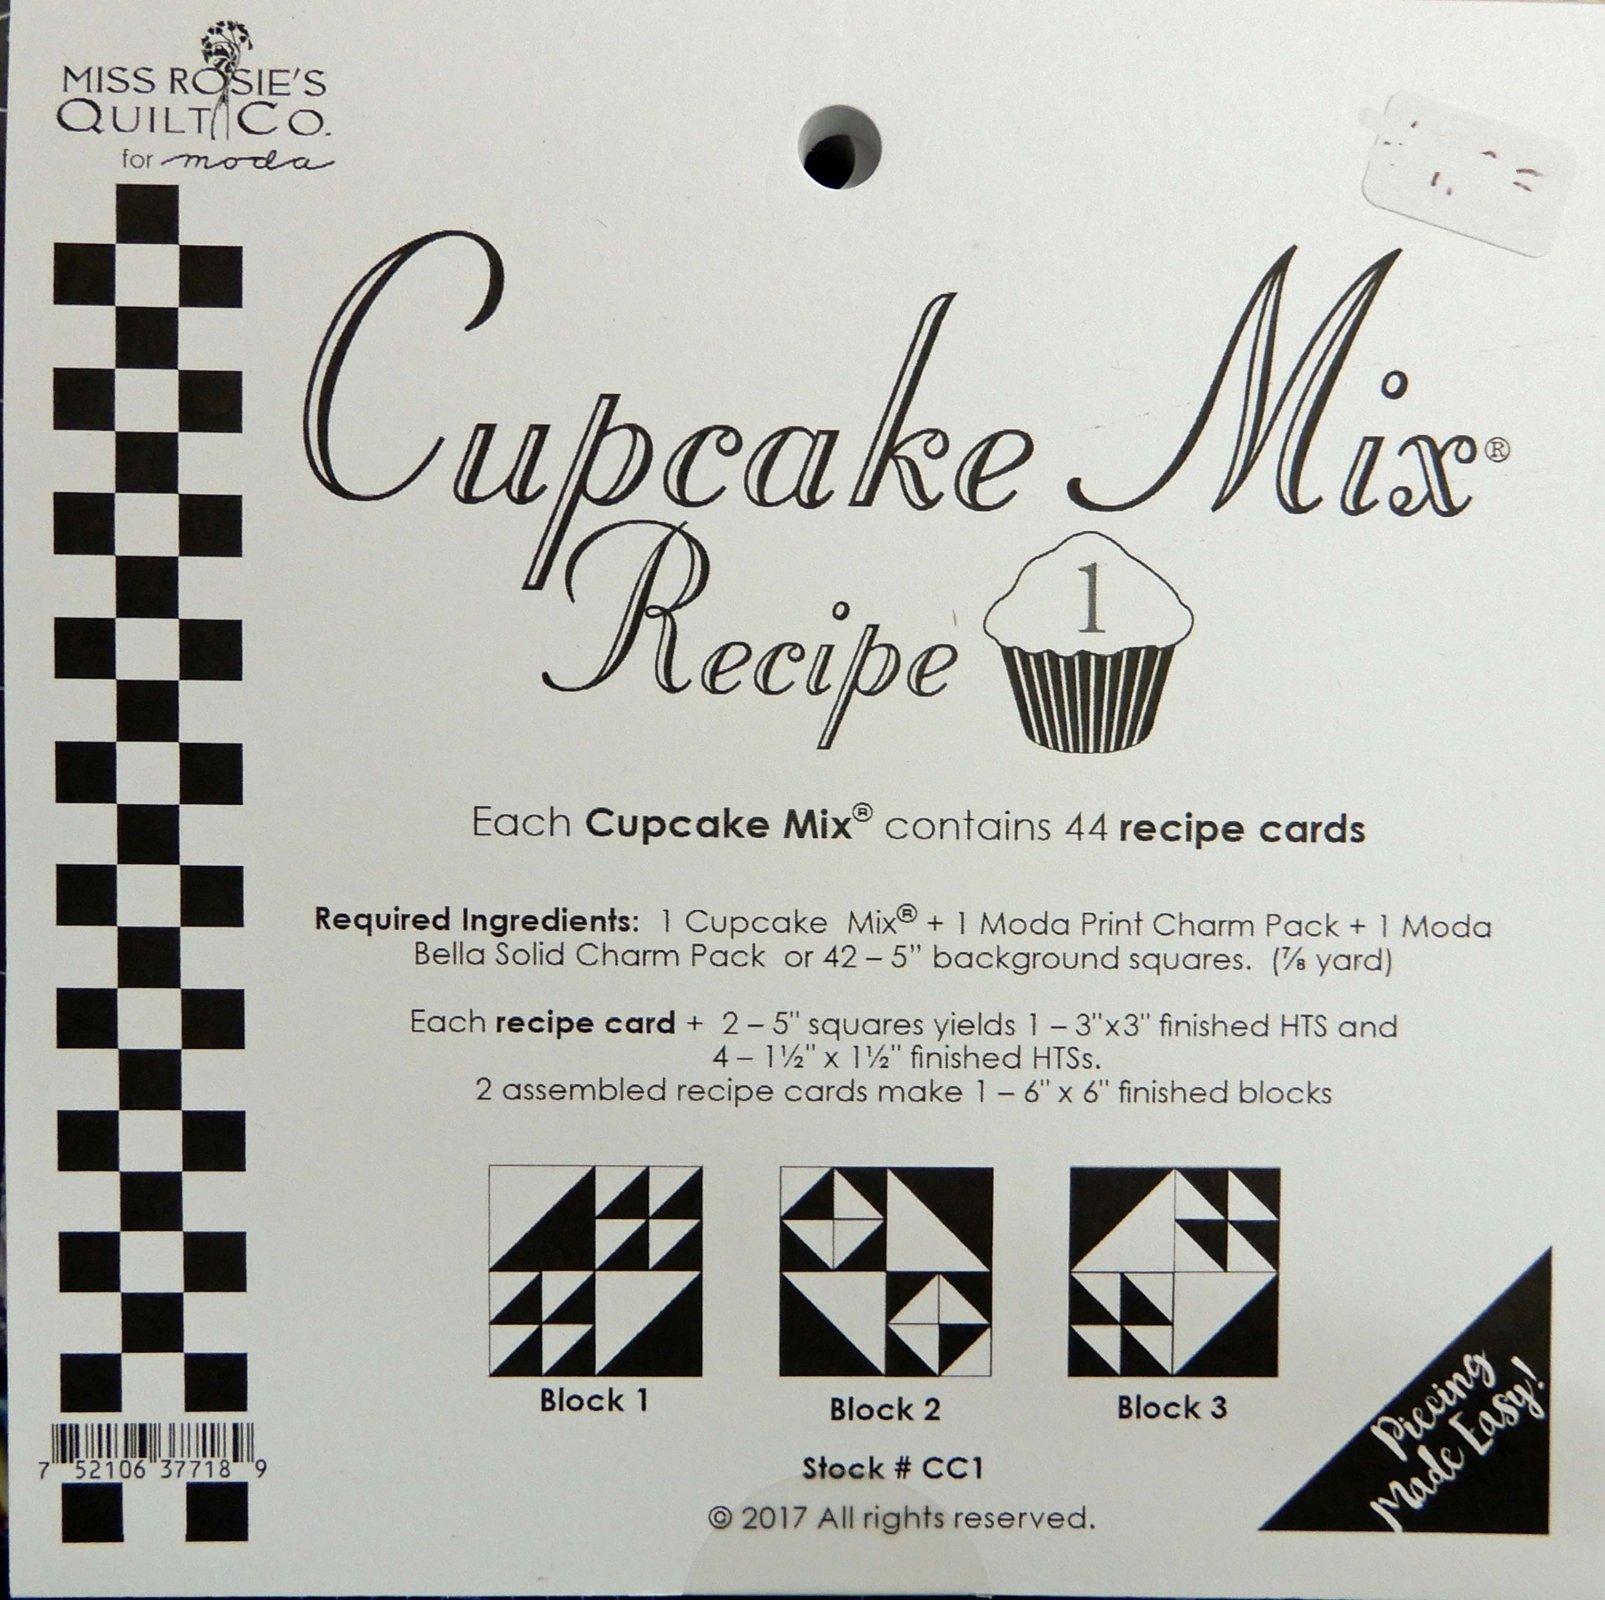 Cupcake Recipe volume 1